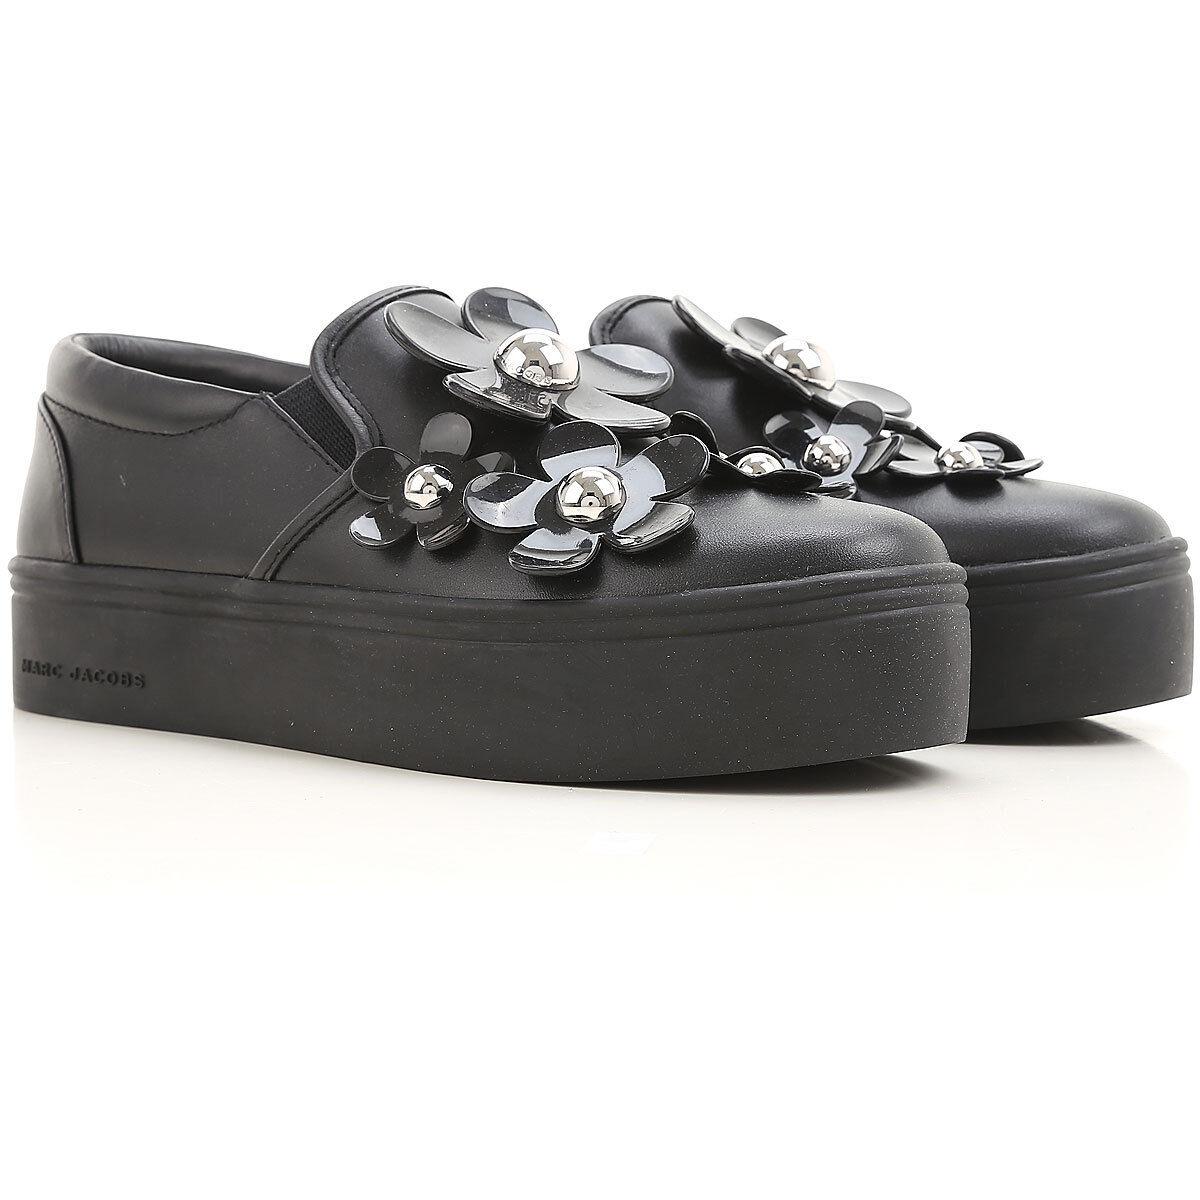 Marc Jacobs Scarpe da Ginnastica skate Daisy, Daisy slip- on skate Ginnastica scarpe da ginnastica a41bde